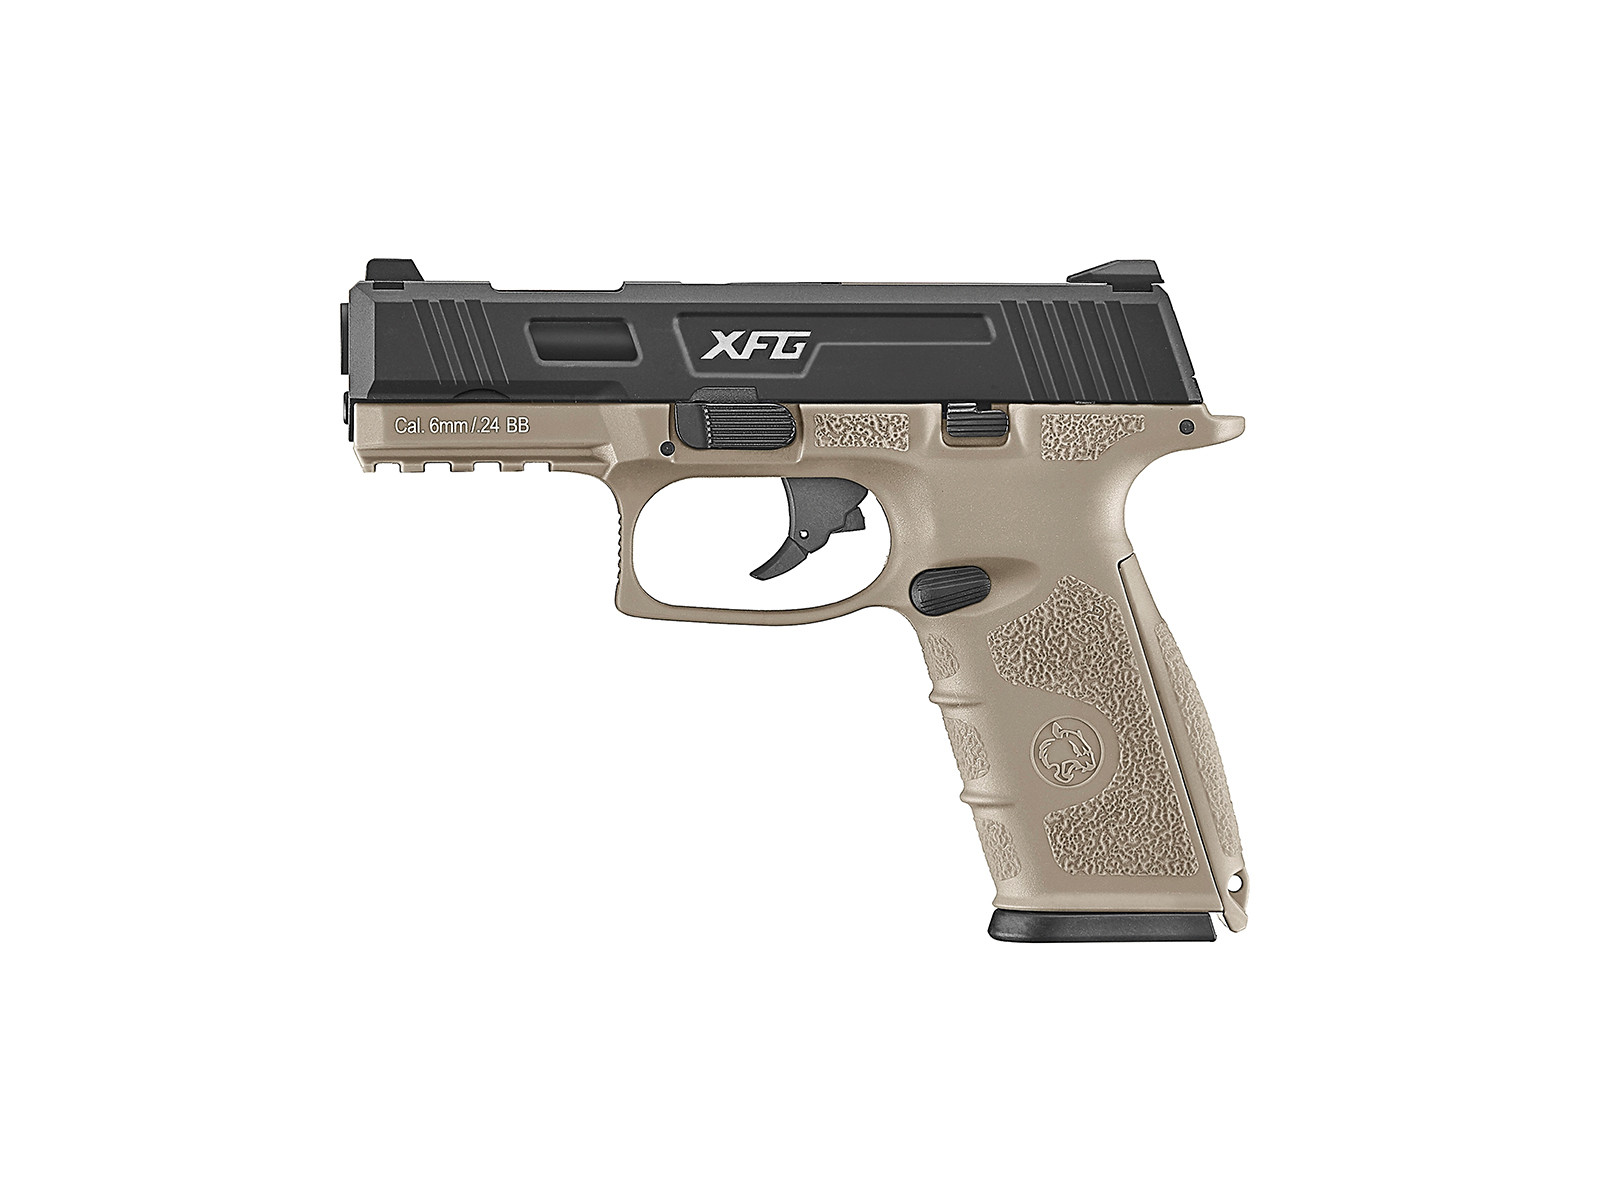 ICS XFG Gas Blowback Airsoft Pistol - Black and Tan